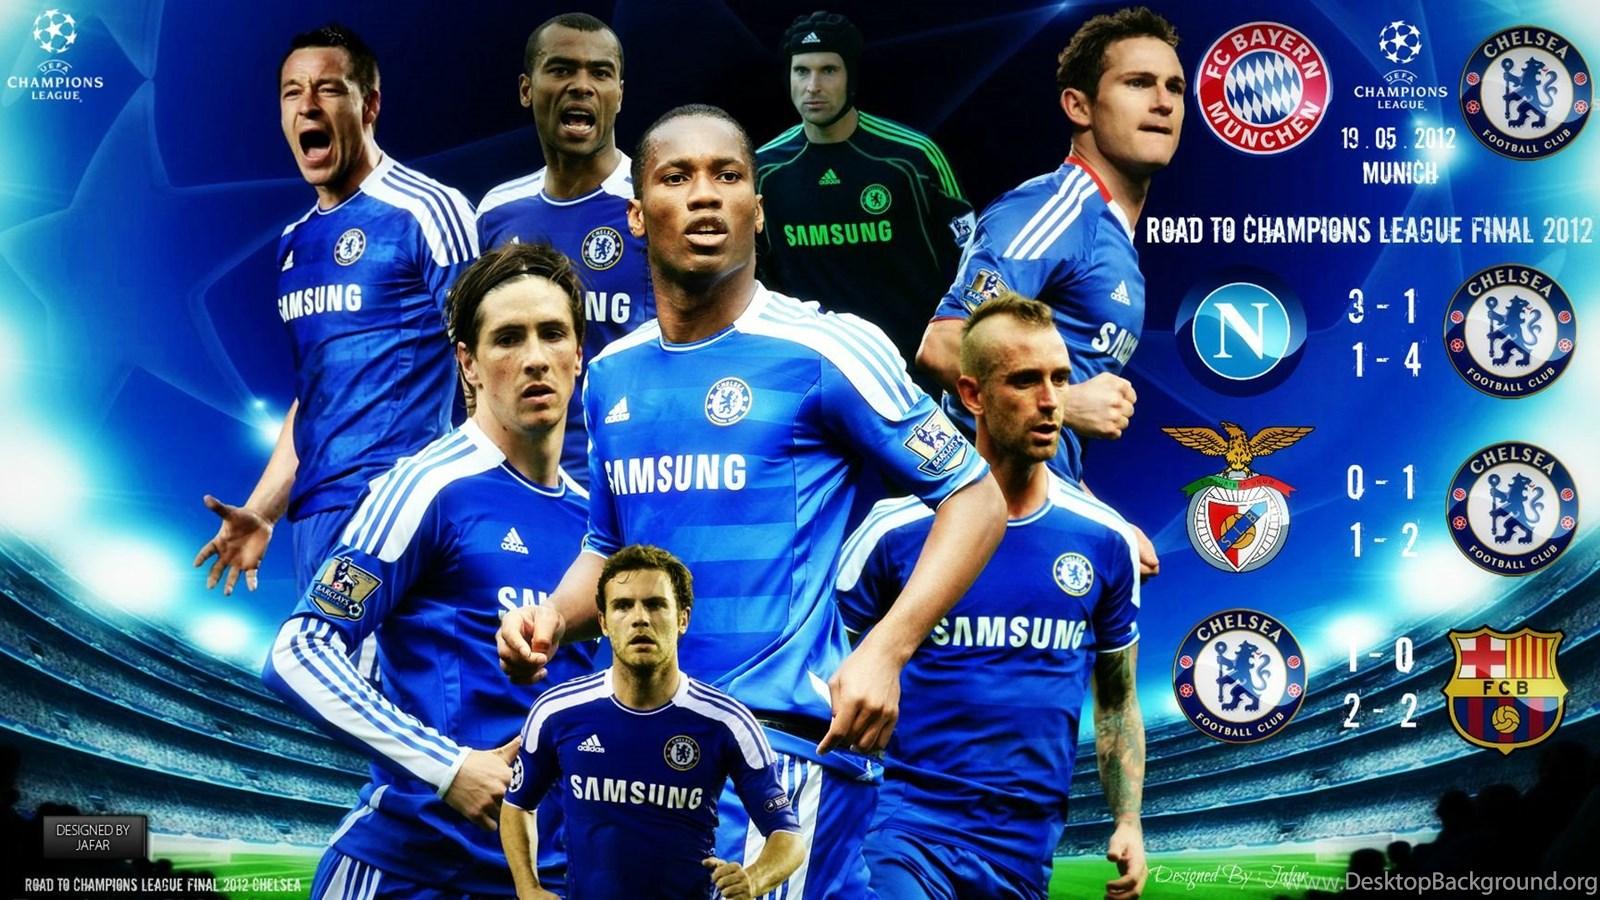 Pic Chelsea Wallpapers Champions League Desktop Background